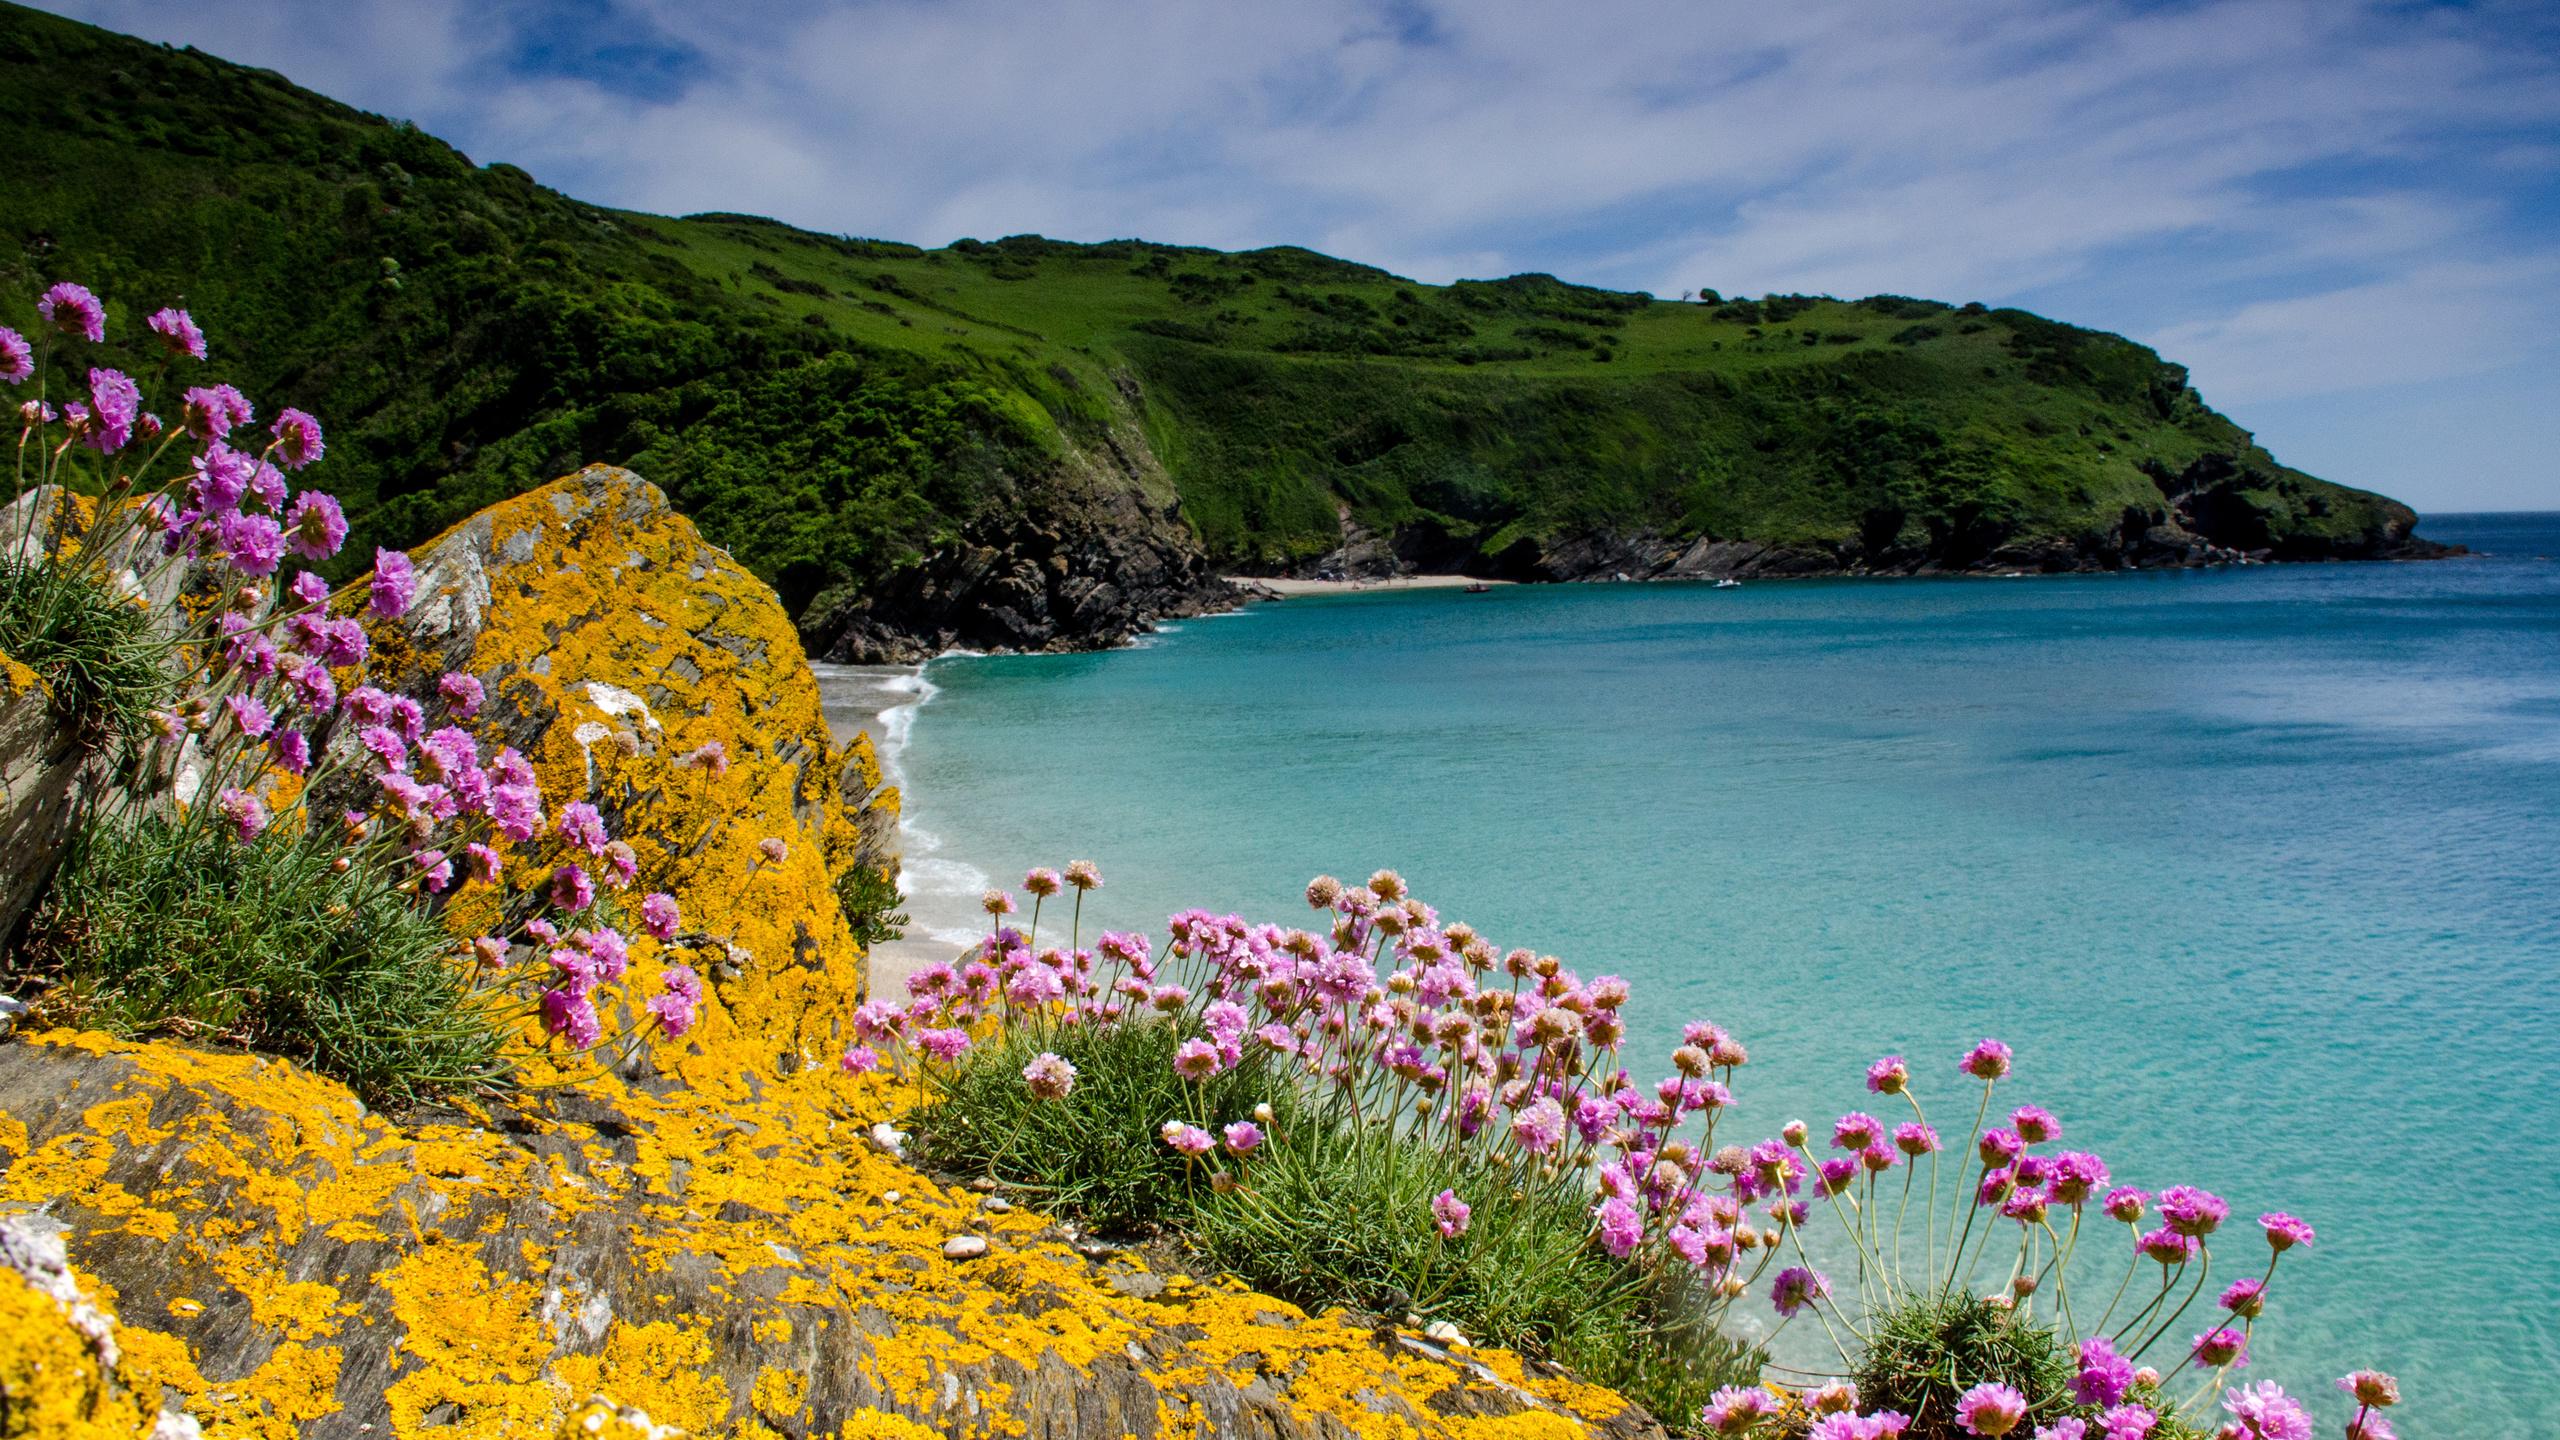 Фото картинки природы и моря